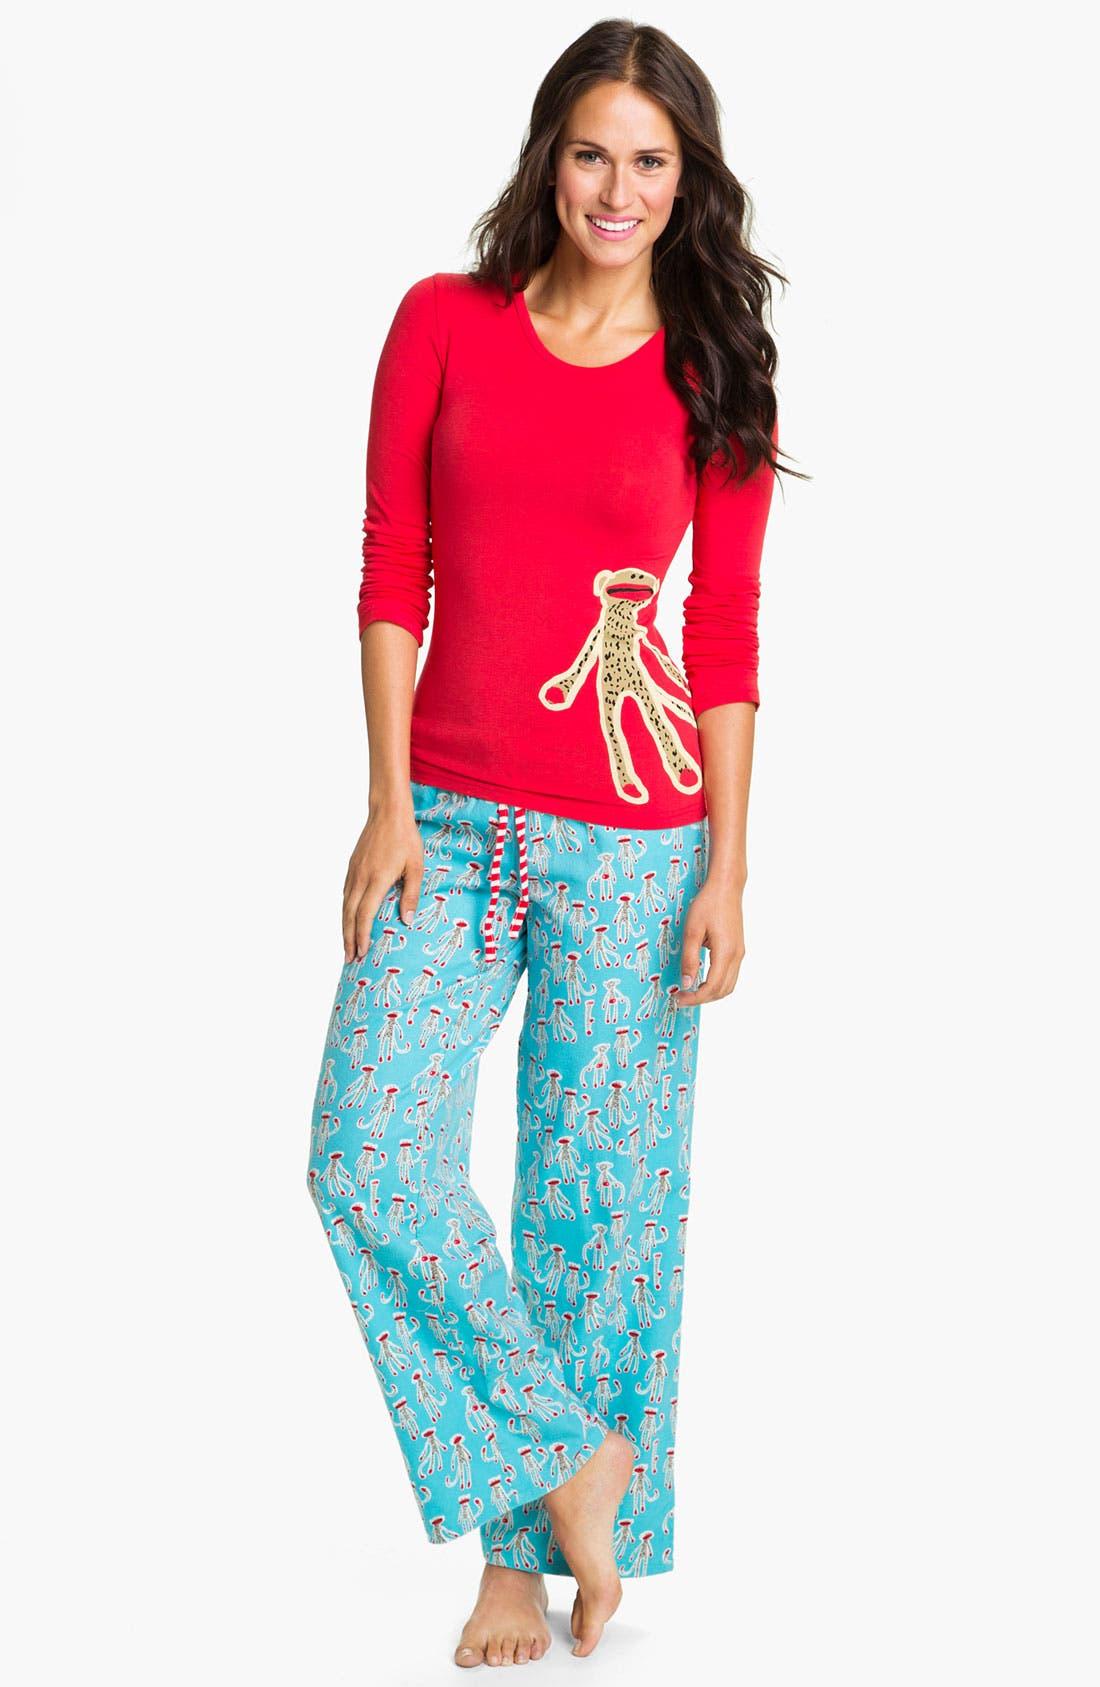 Main Image - Munki Munki Knit & Flannel Pajamas